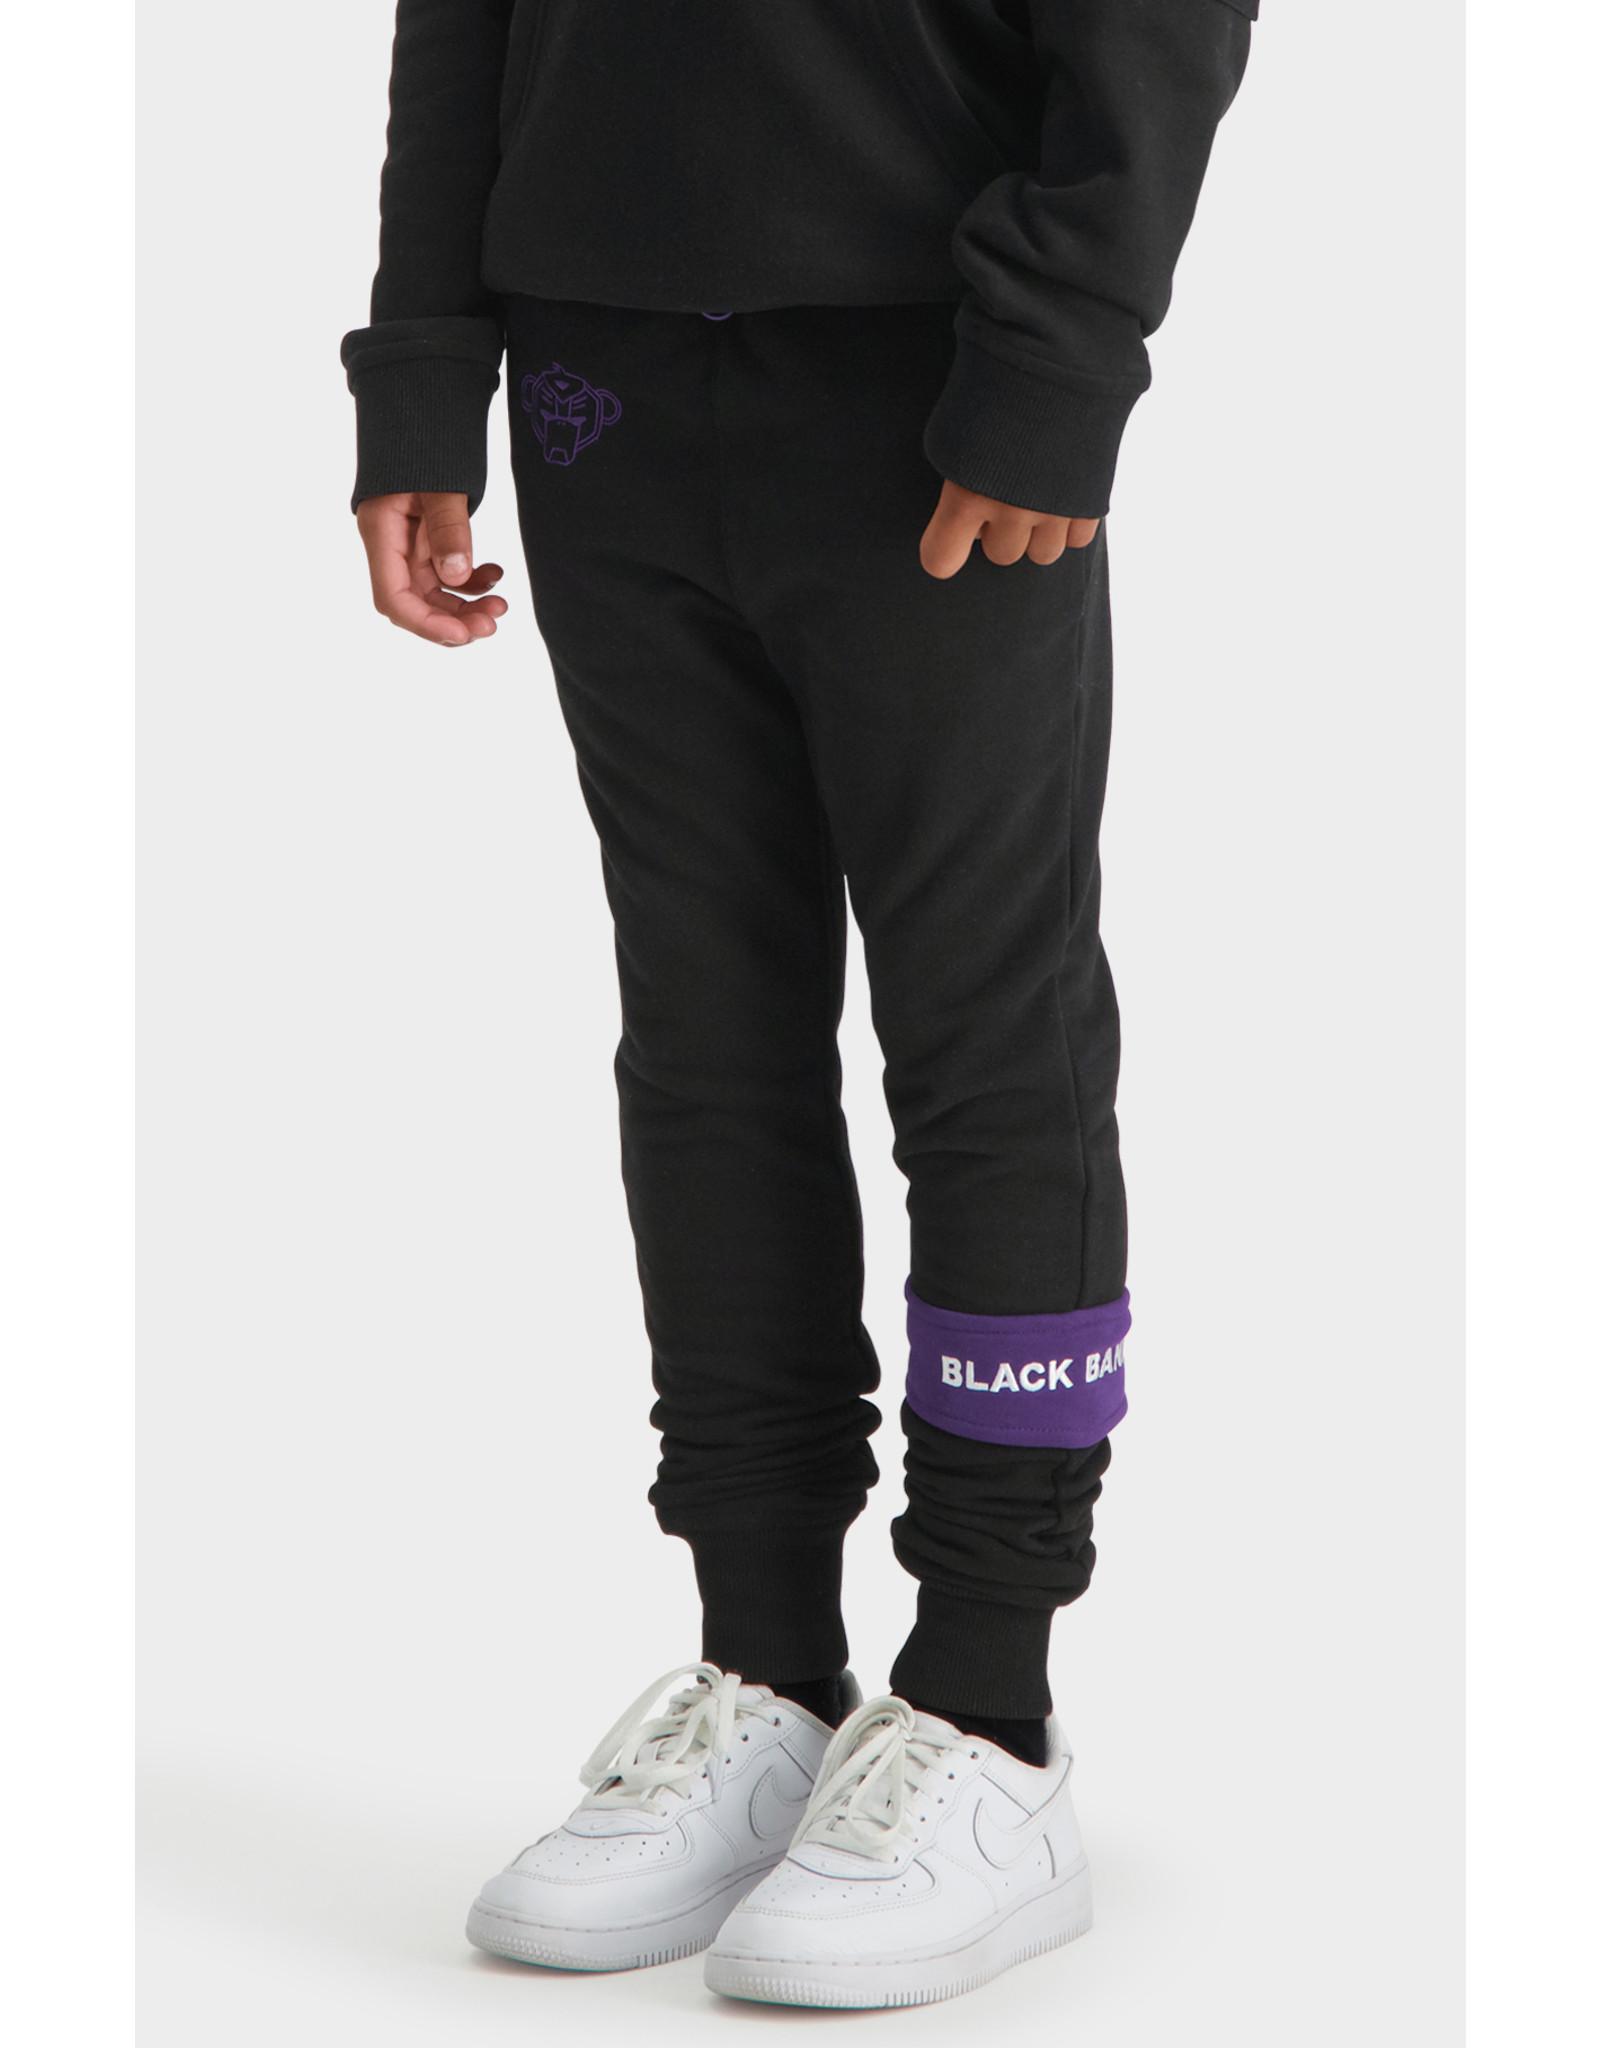 Black Bananas Jr Command Sweatpants Black/Purple